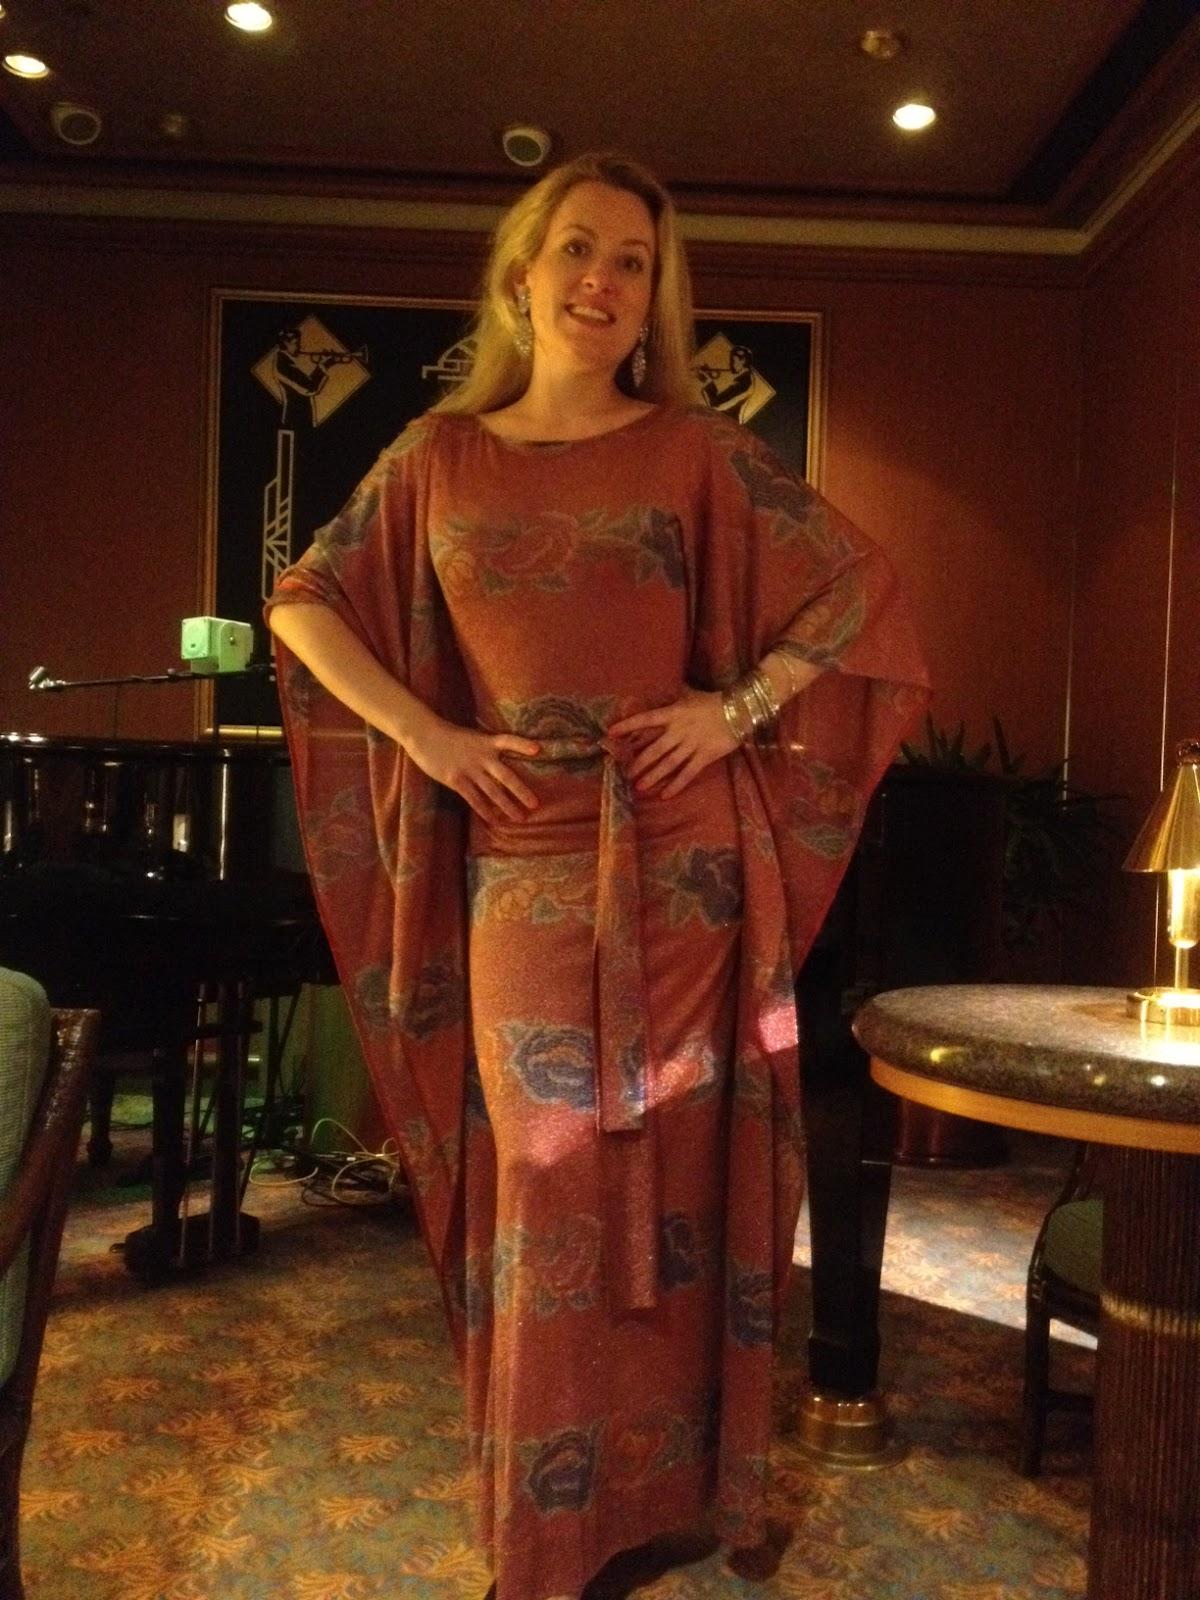 Xtabay Vintage Clothing Boutique - Portland, Oregon: Top 20 Dresses ...